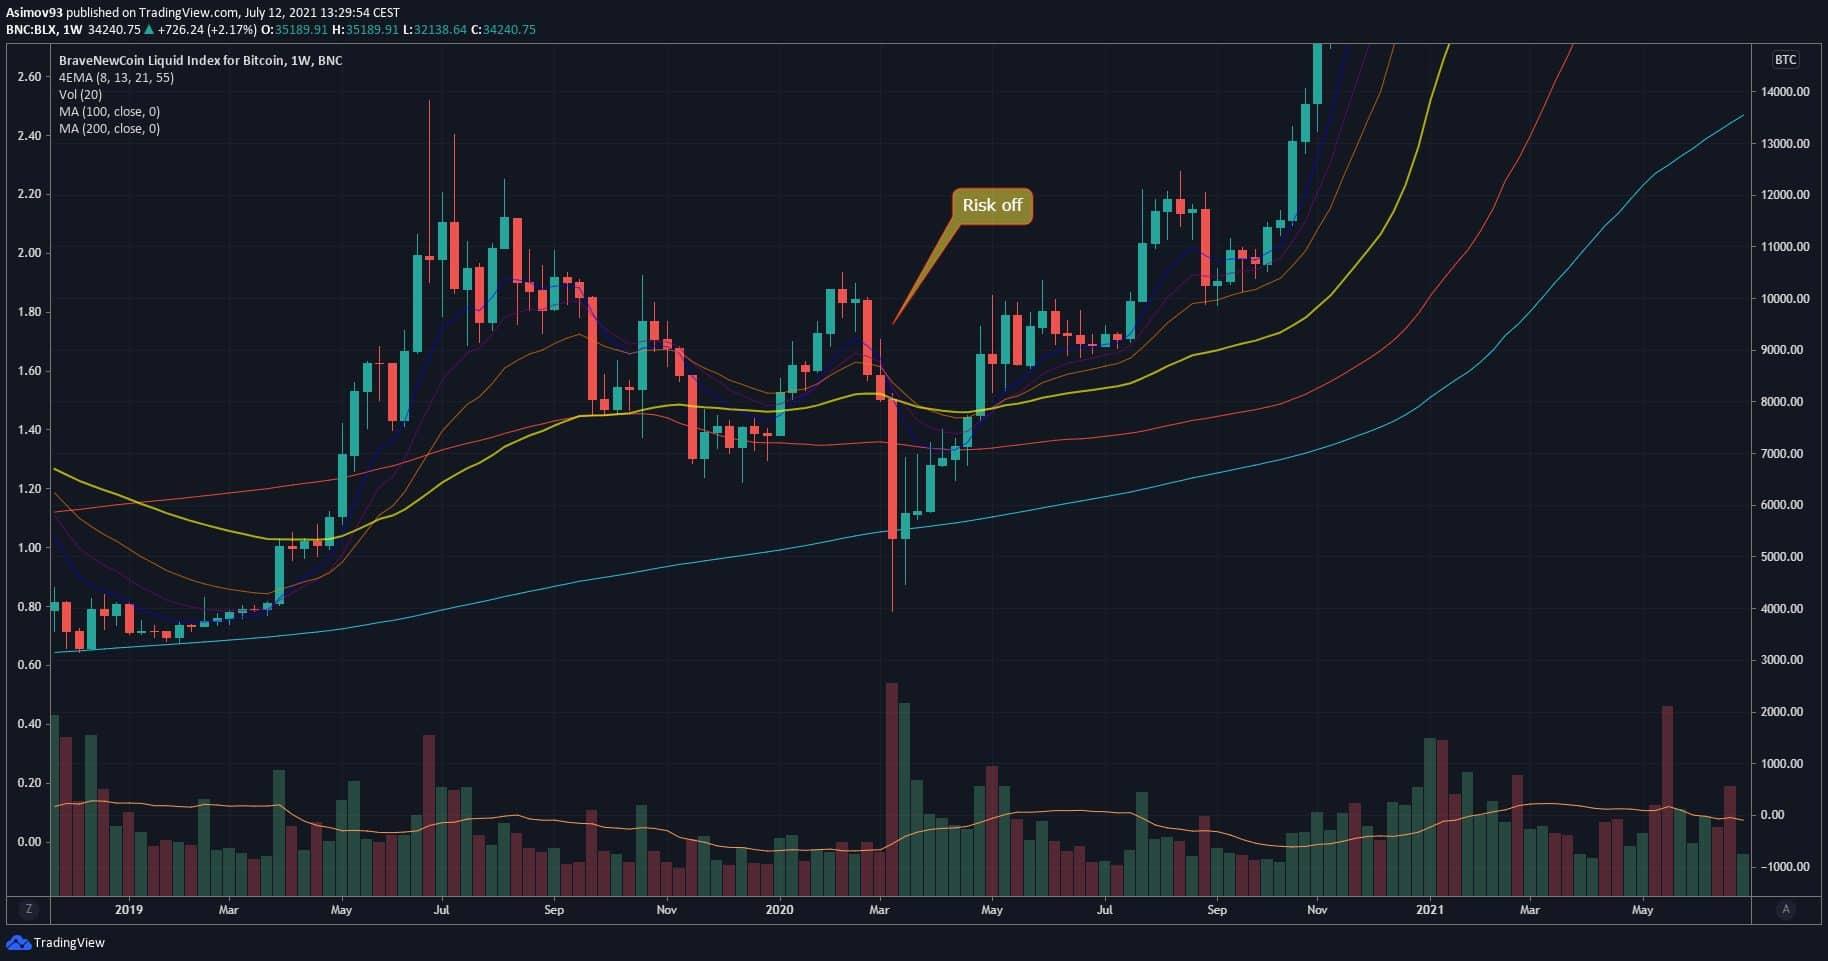 Risk-off Bitcoin